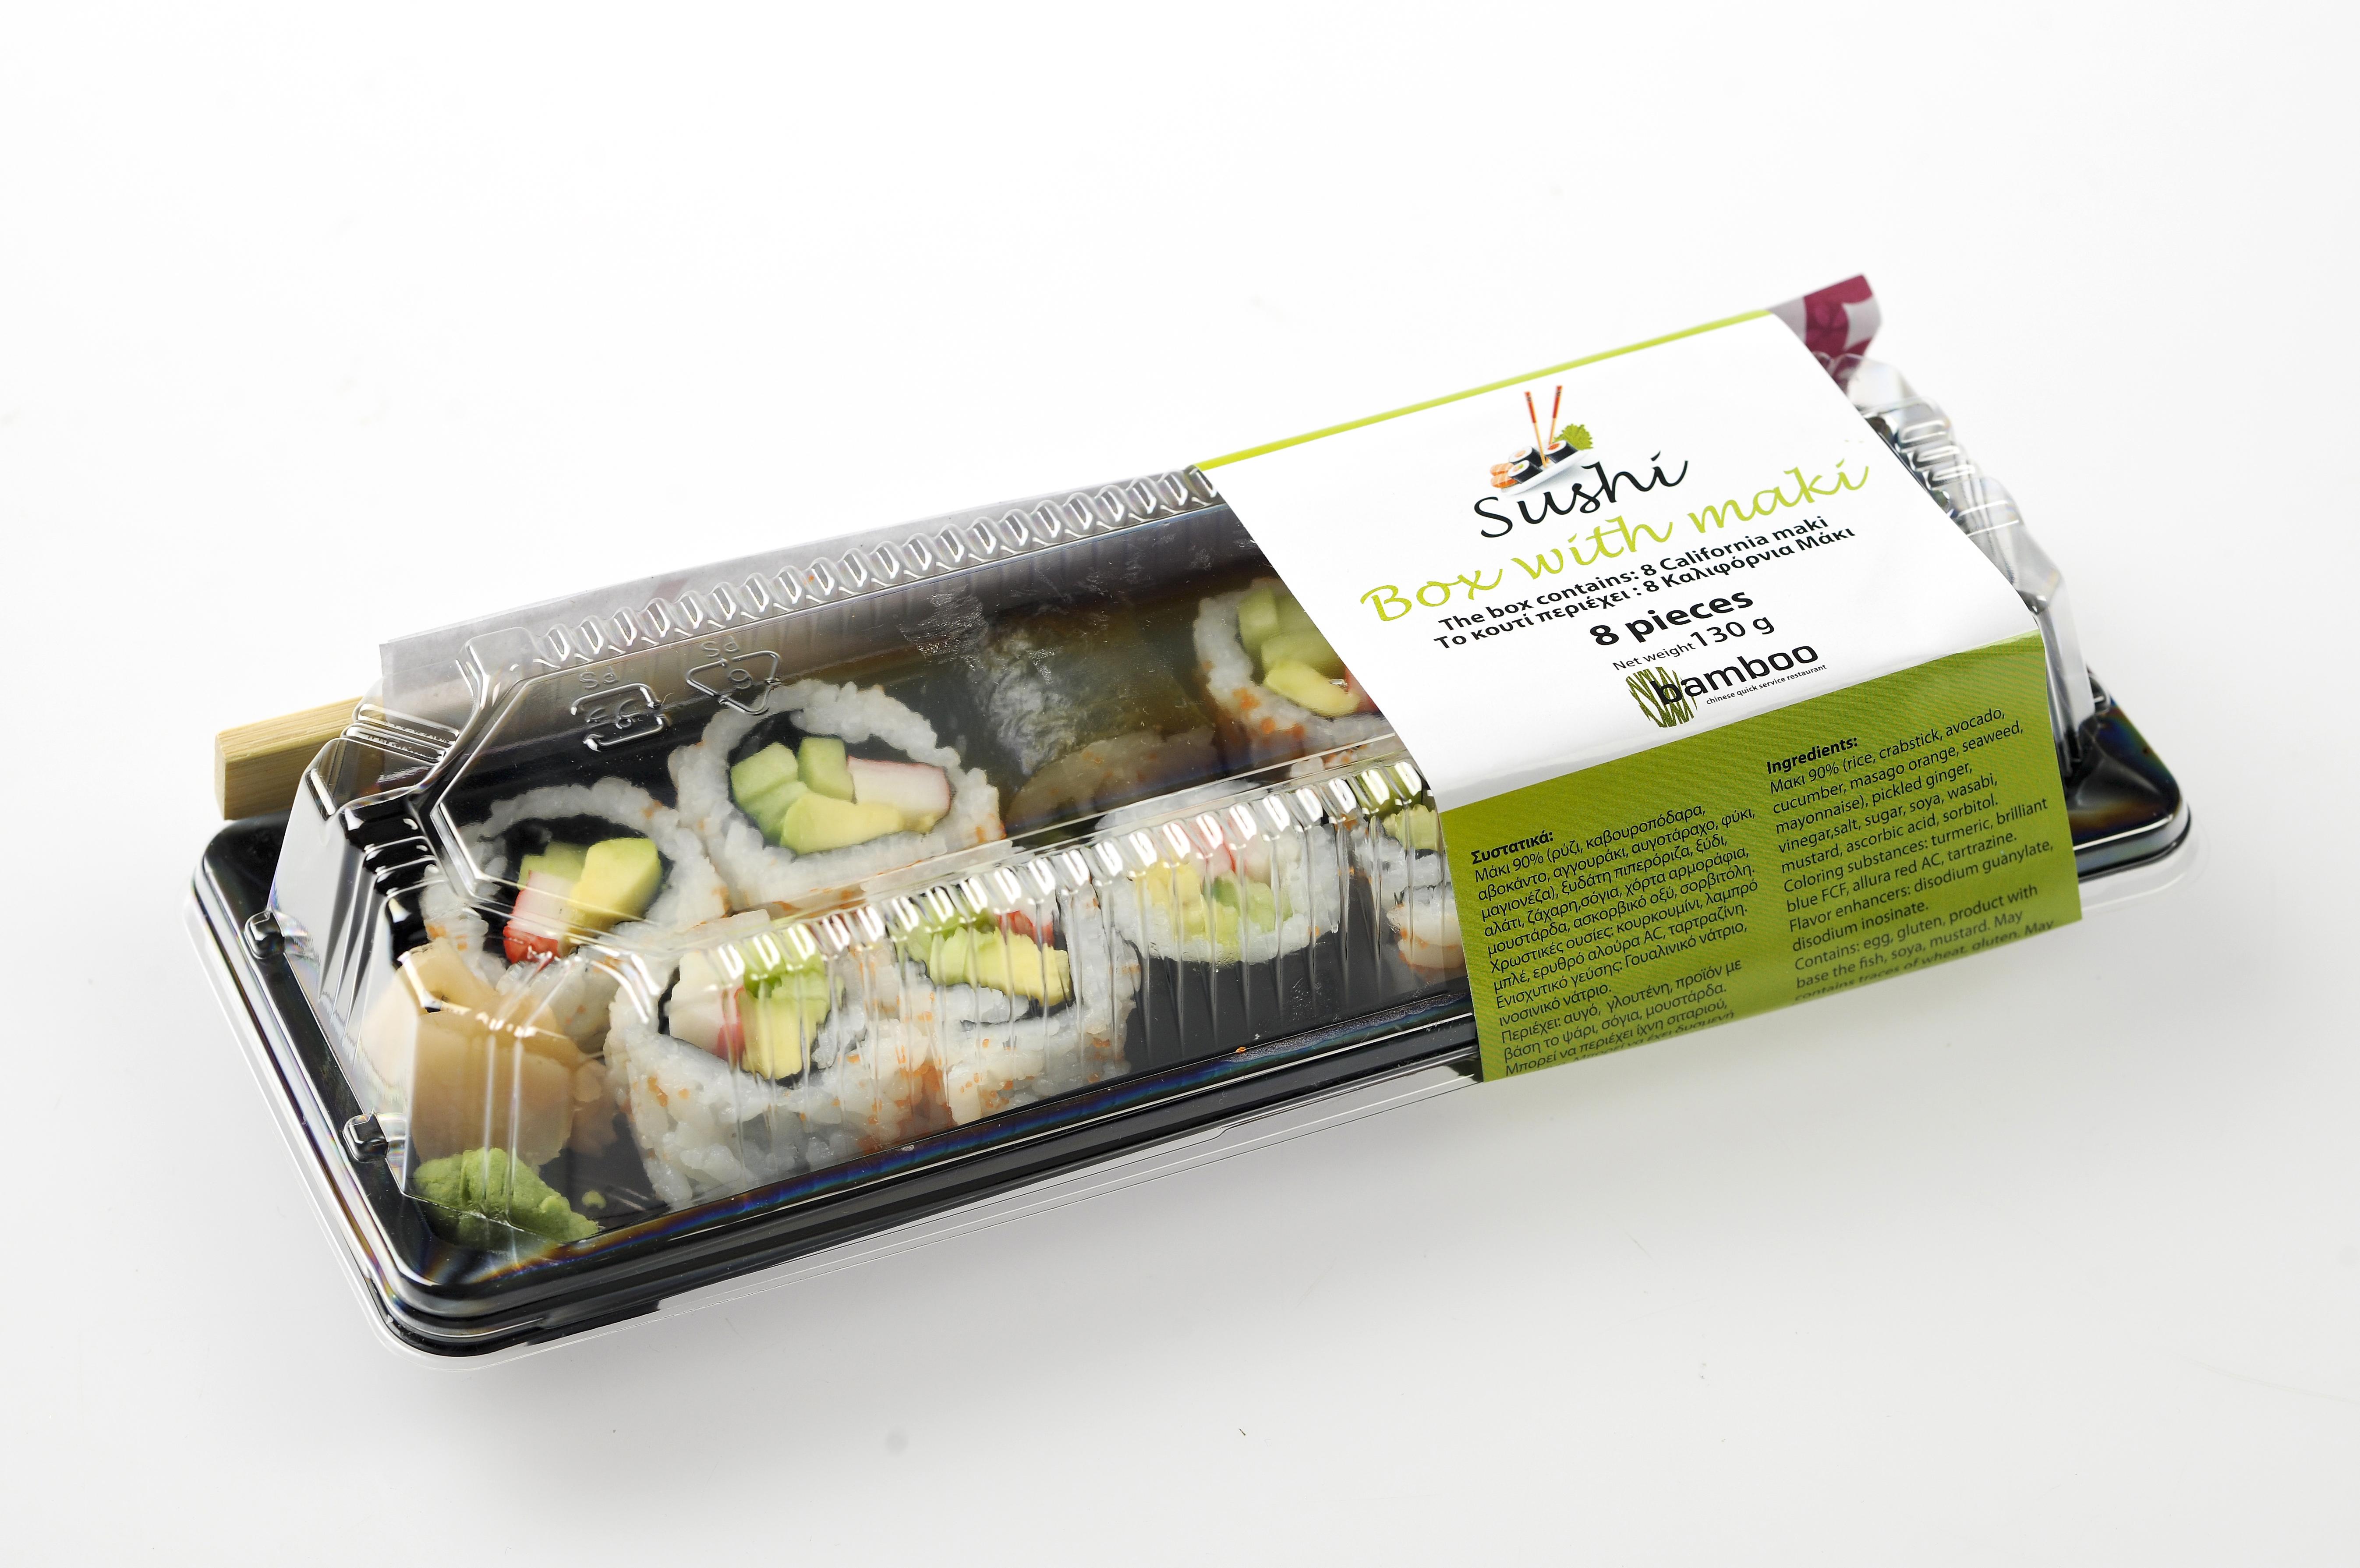 Akai Sushi Labeling